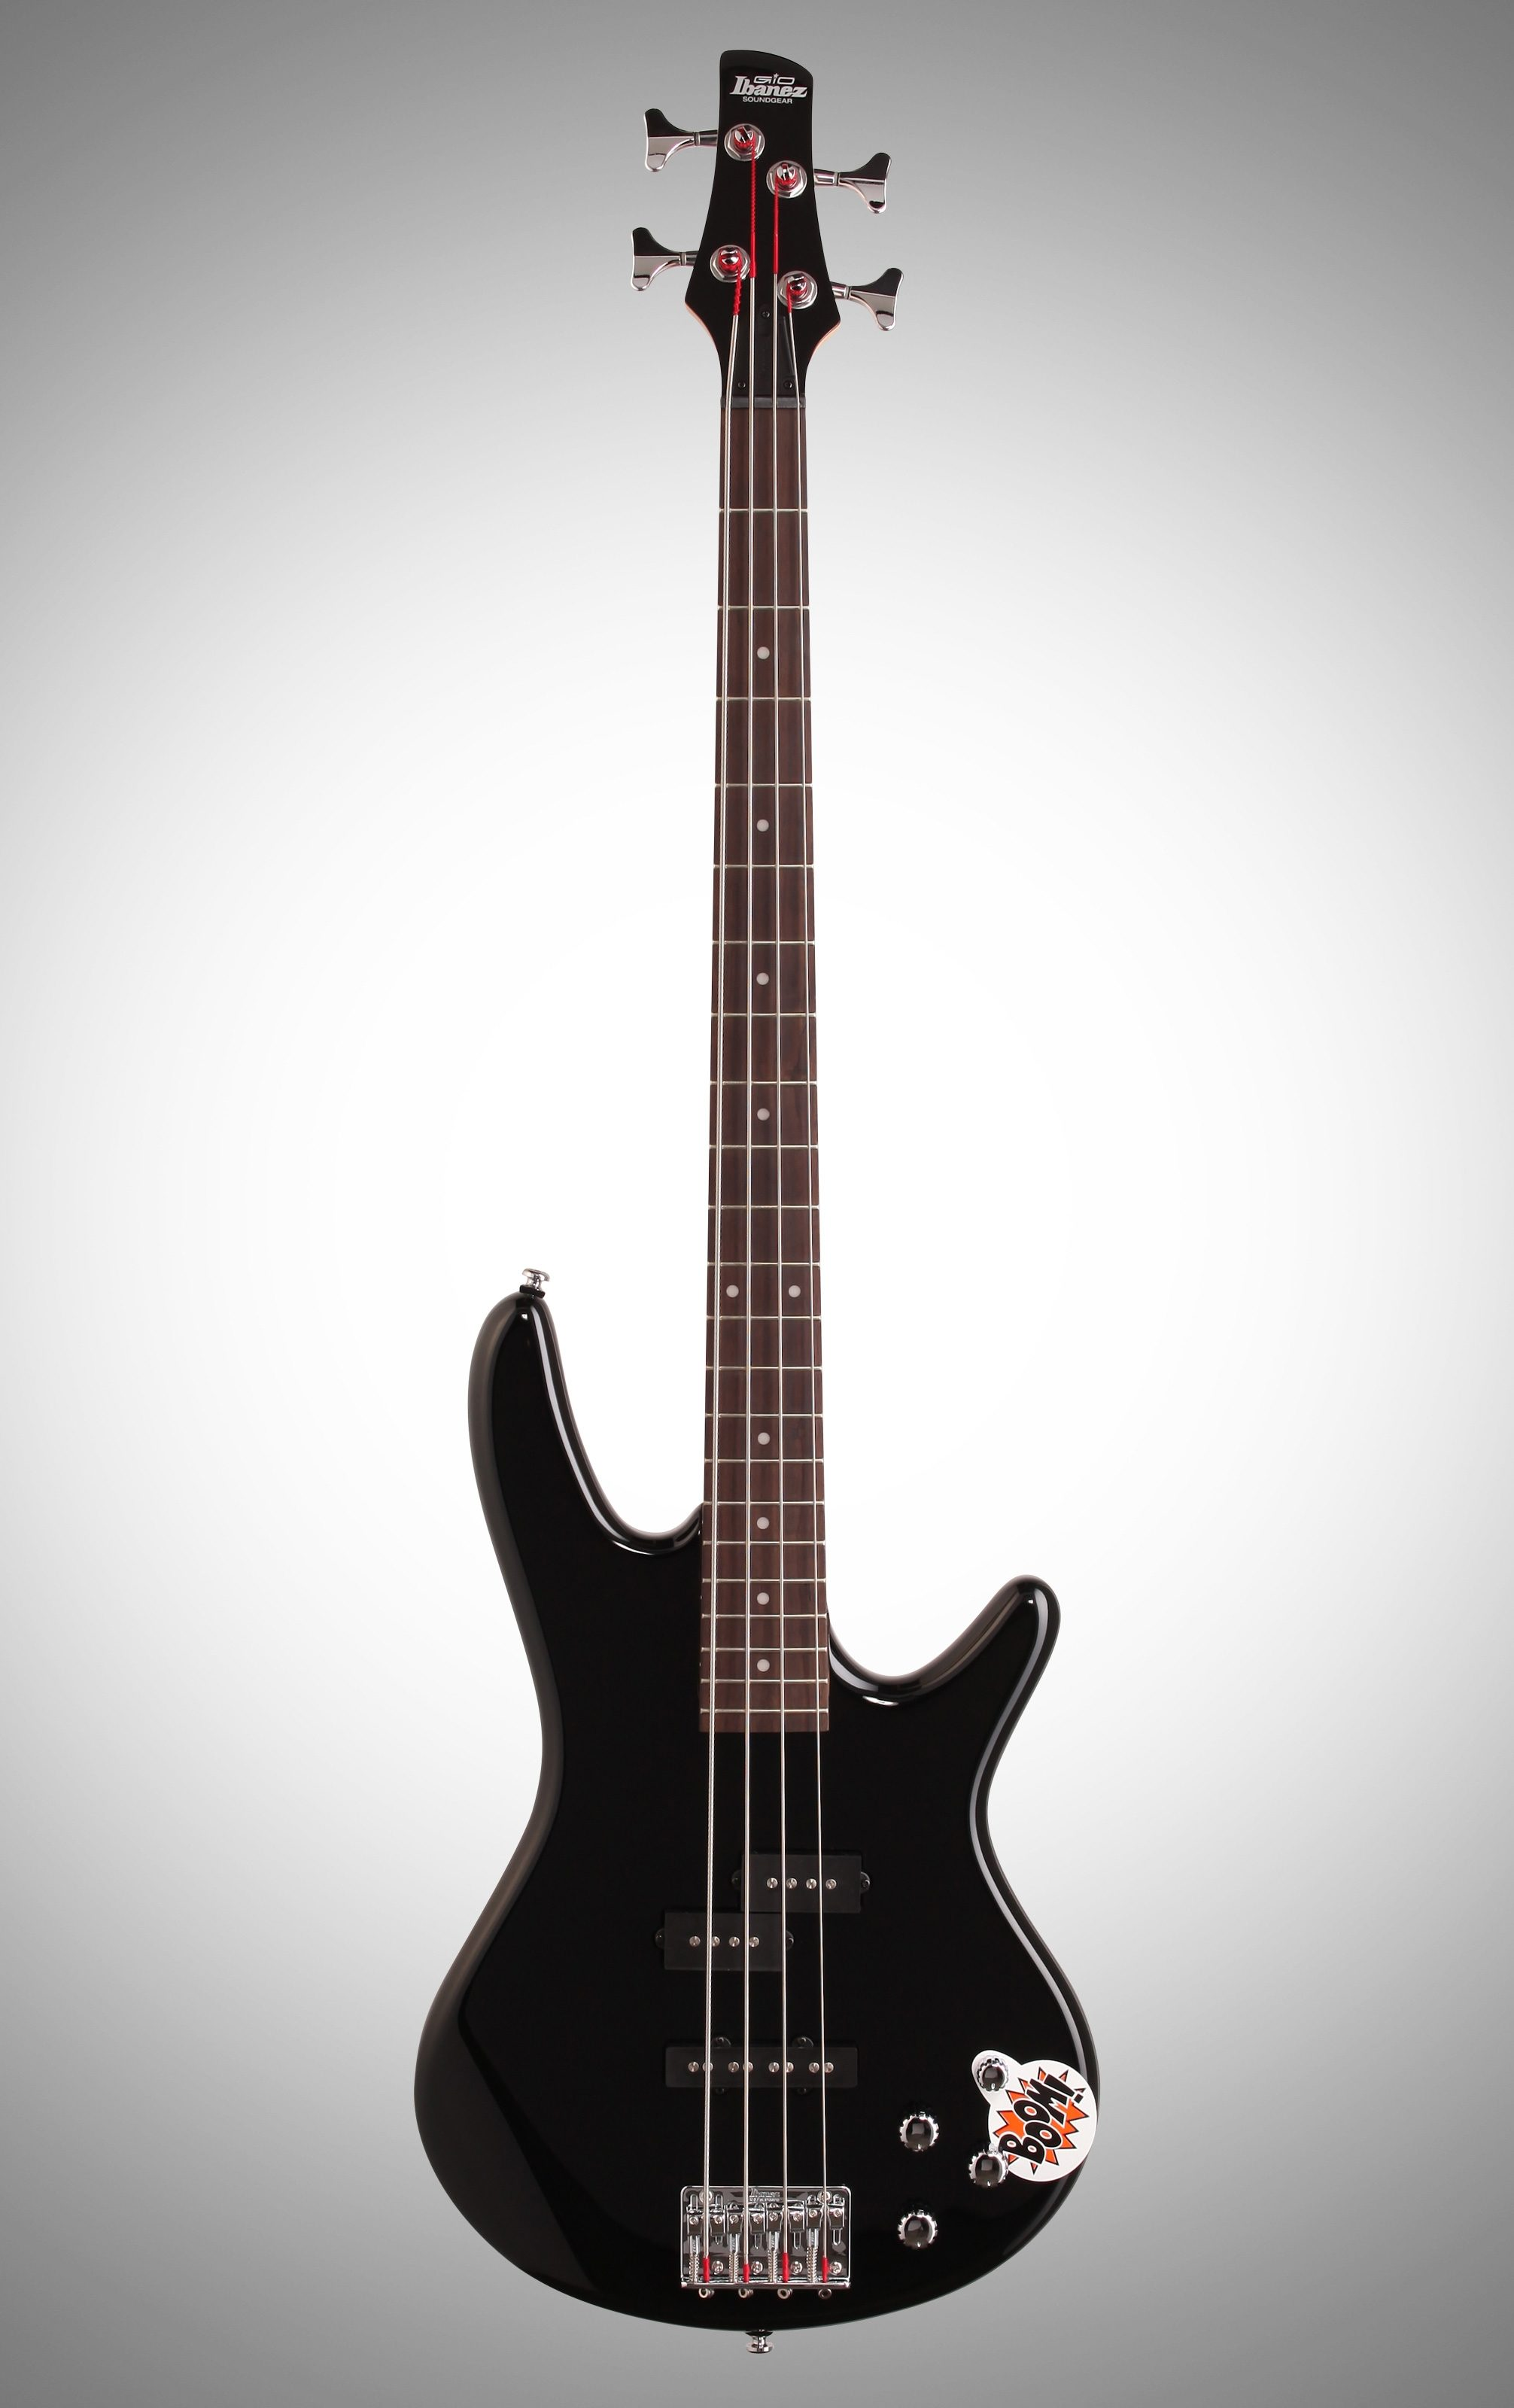 Ibanez Gsr200 Electric Bass Black